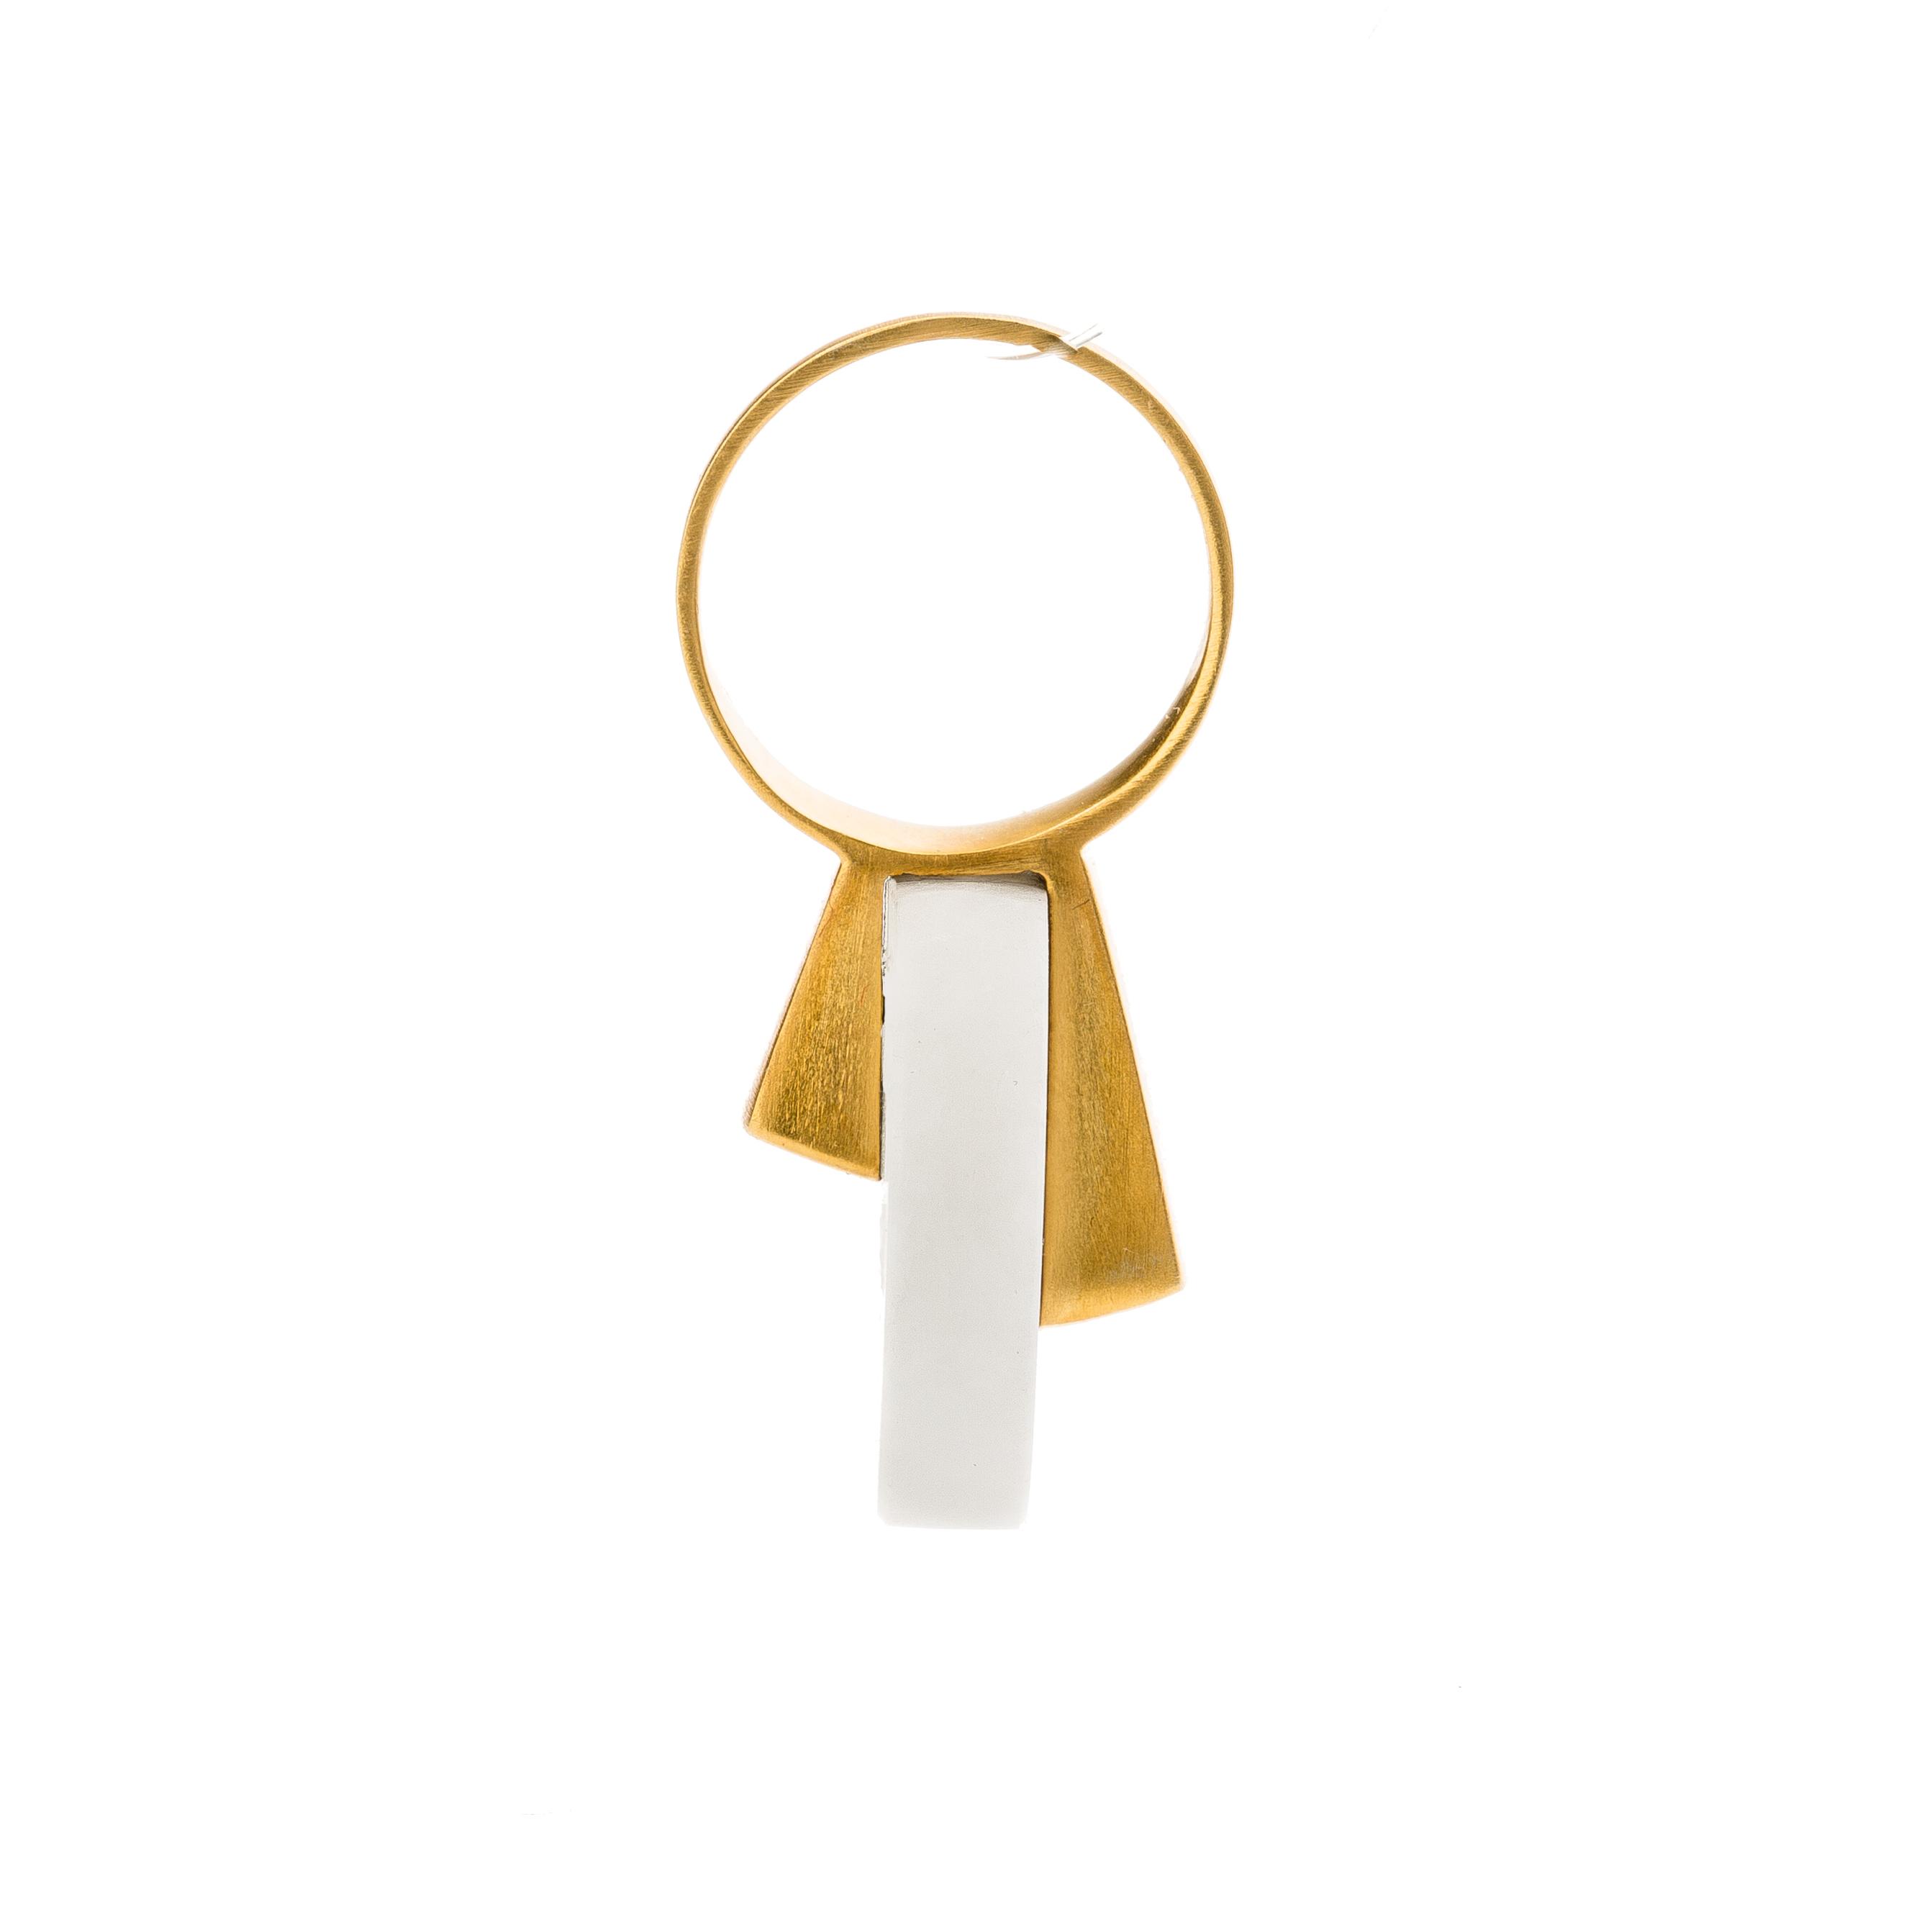 Thymeli 2 ring